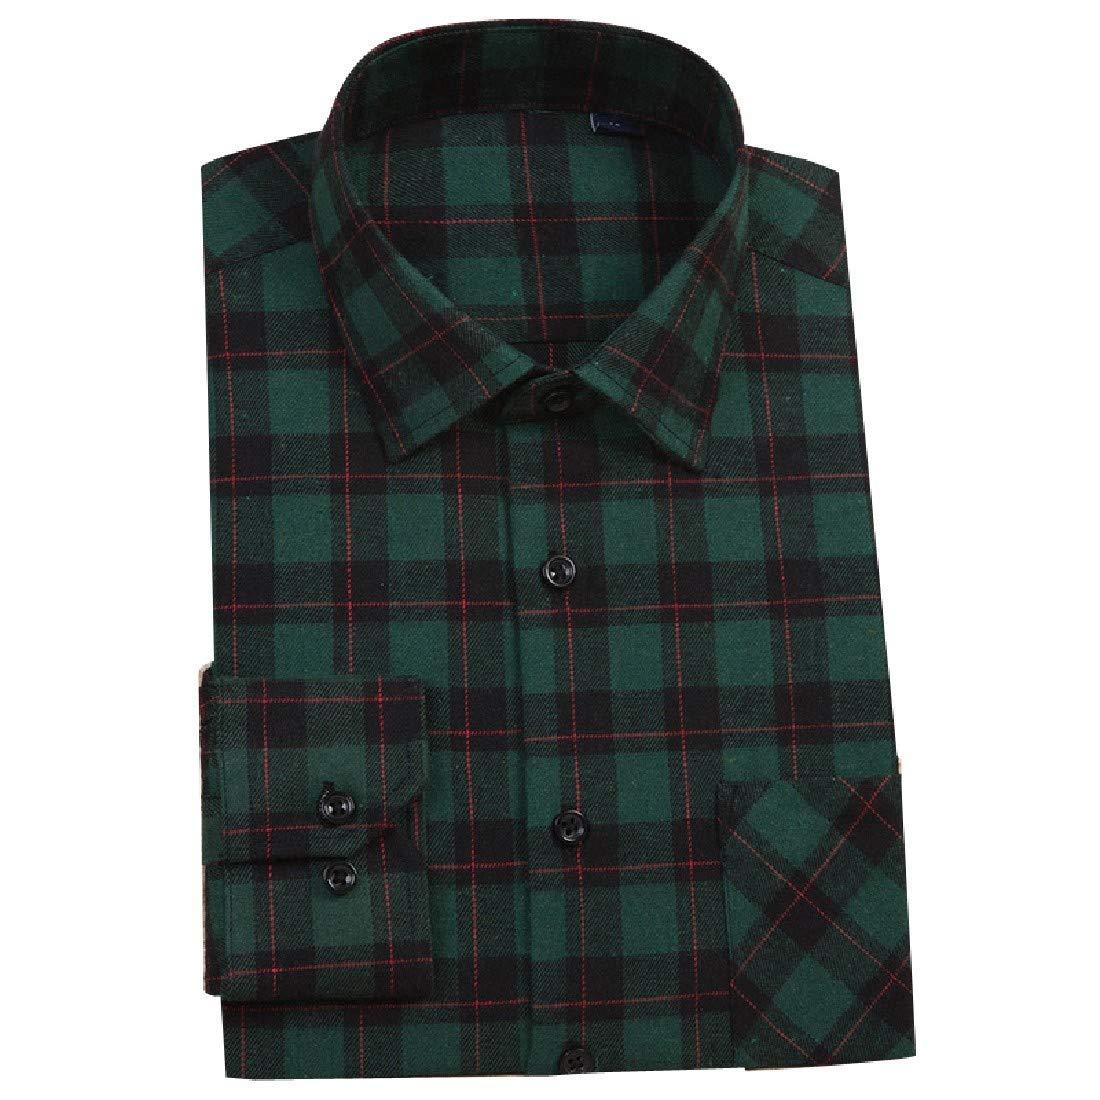 YUNY Mens Flannel Plaid Lounge Long-Sleeve Button Down Shirt 5 2XL